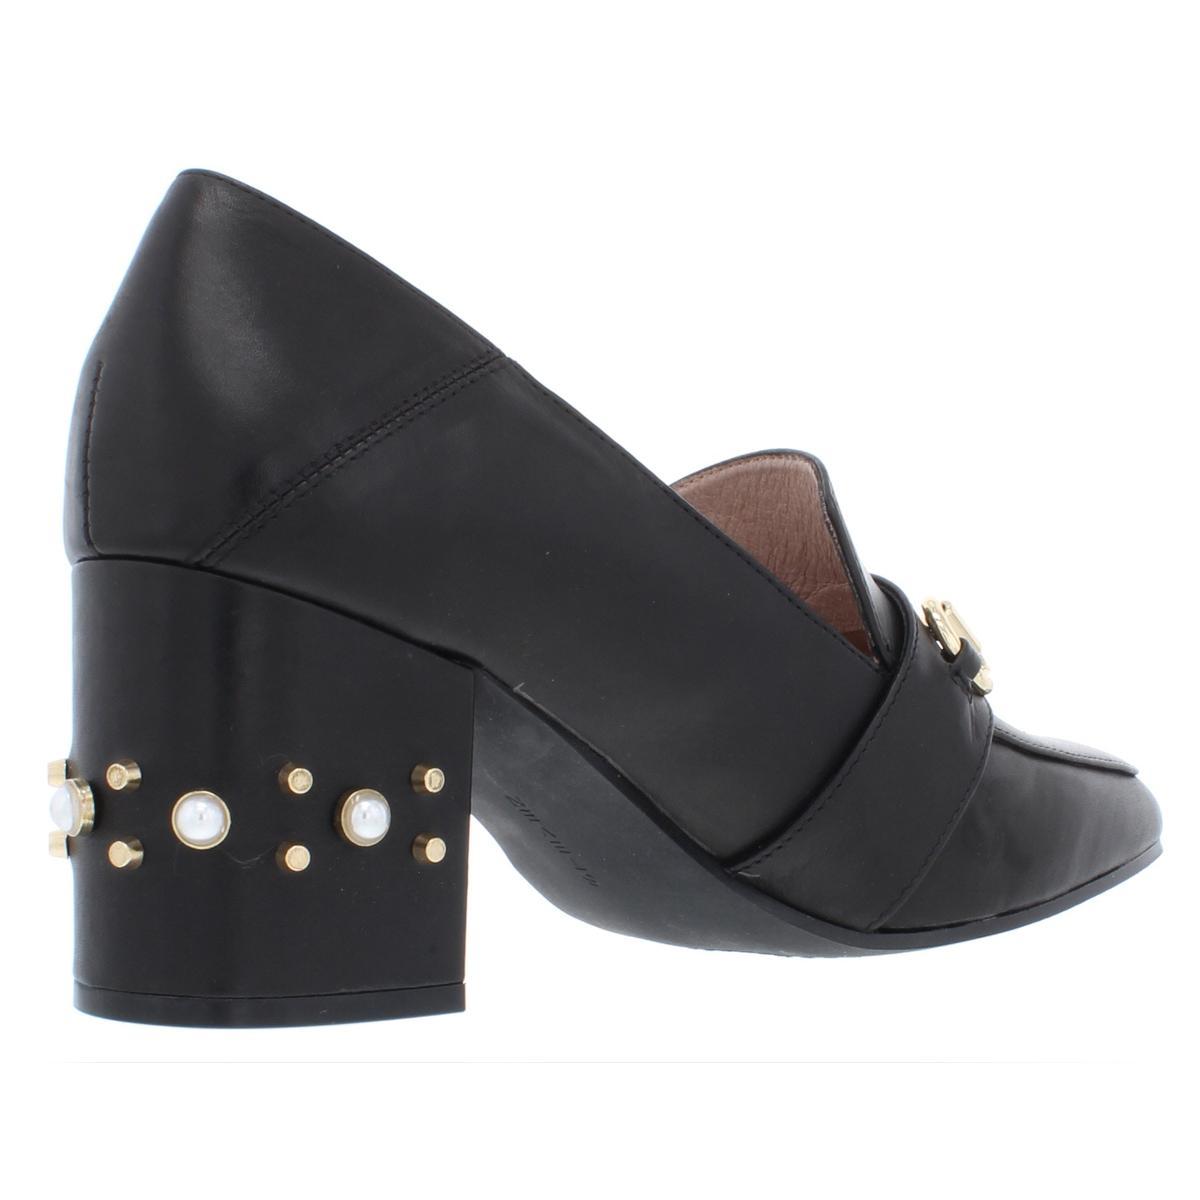 Steven-By-Steve-Madden-Womens-Layla-Leather-Pumps-Block-Heels-Shoes-BHFO-1604 thumbnail 4